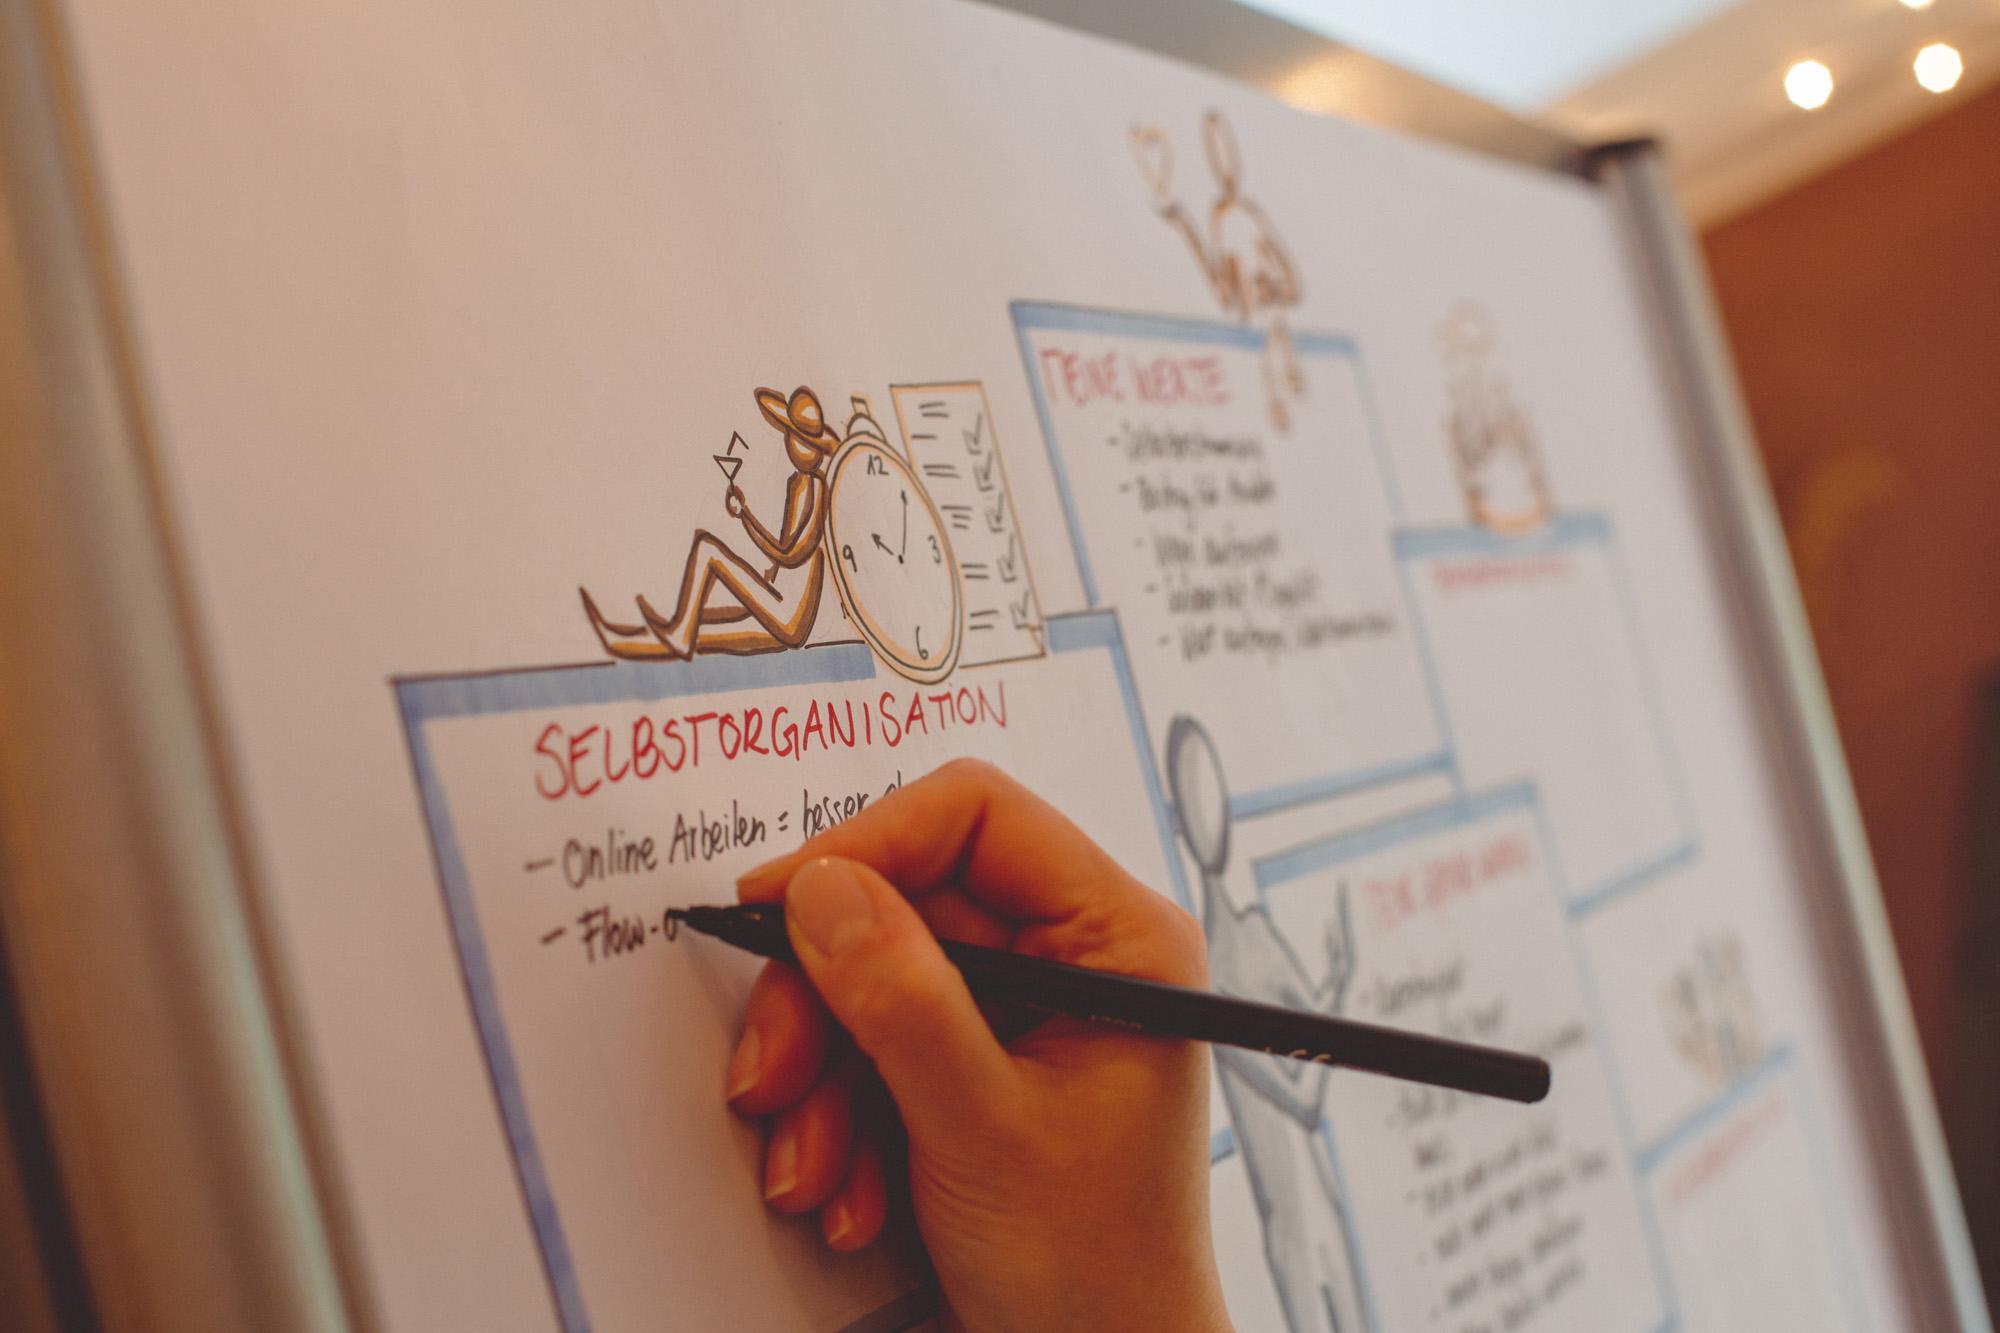 Coaching-individuelle-Visualisierung-Tutsek